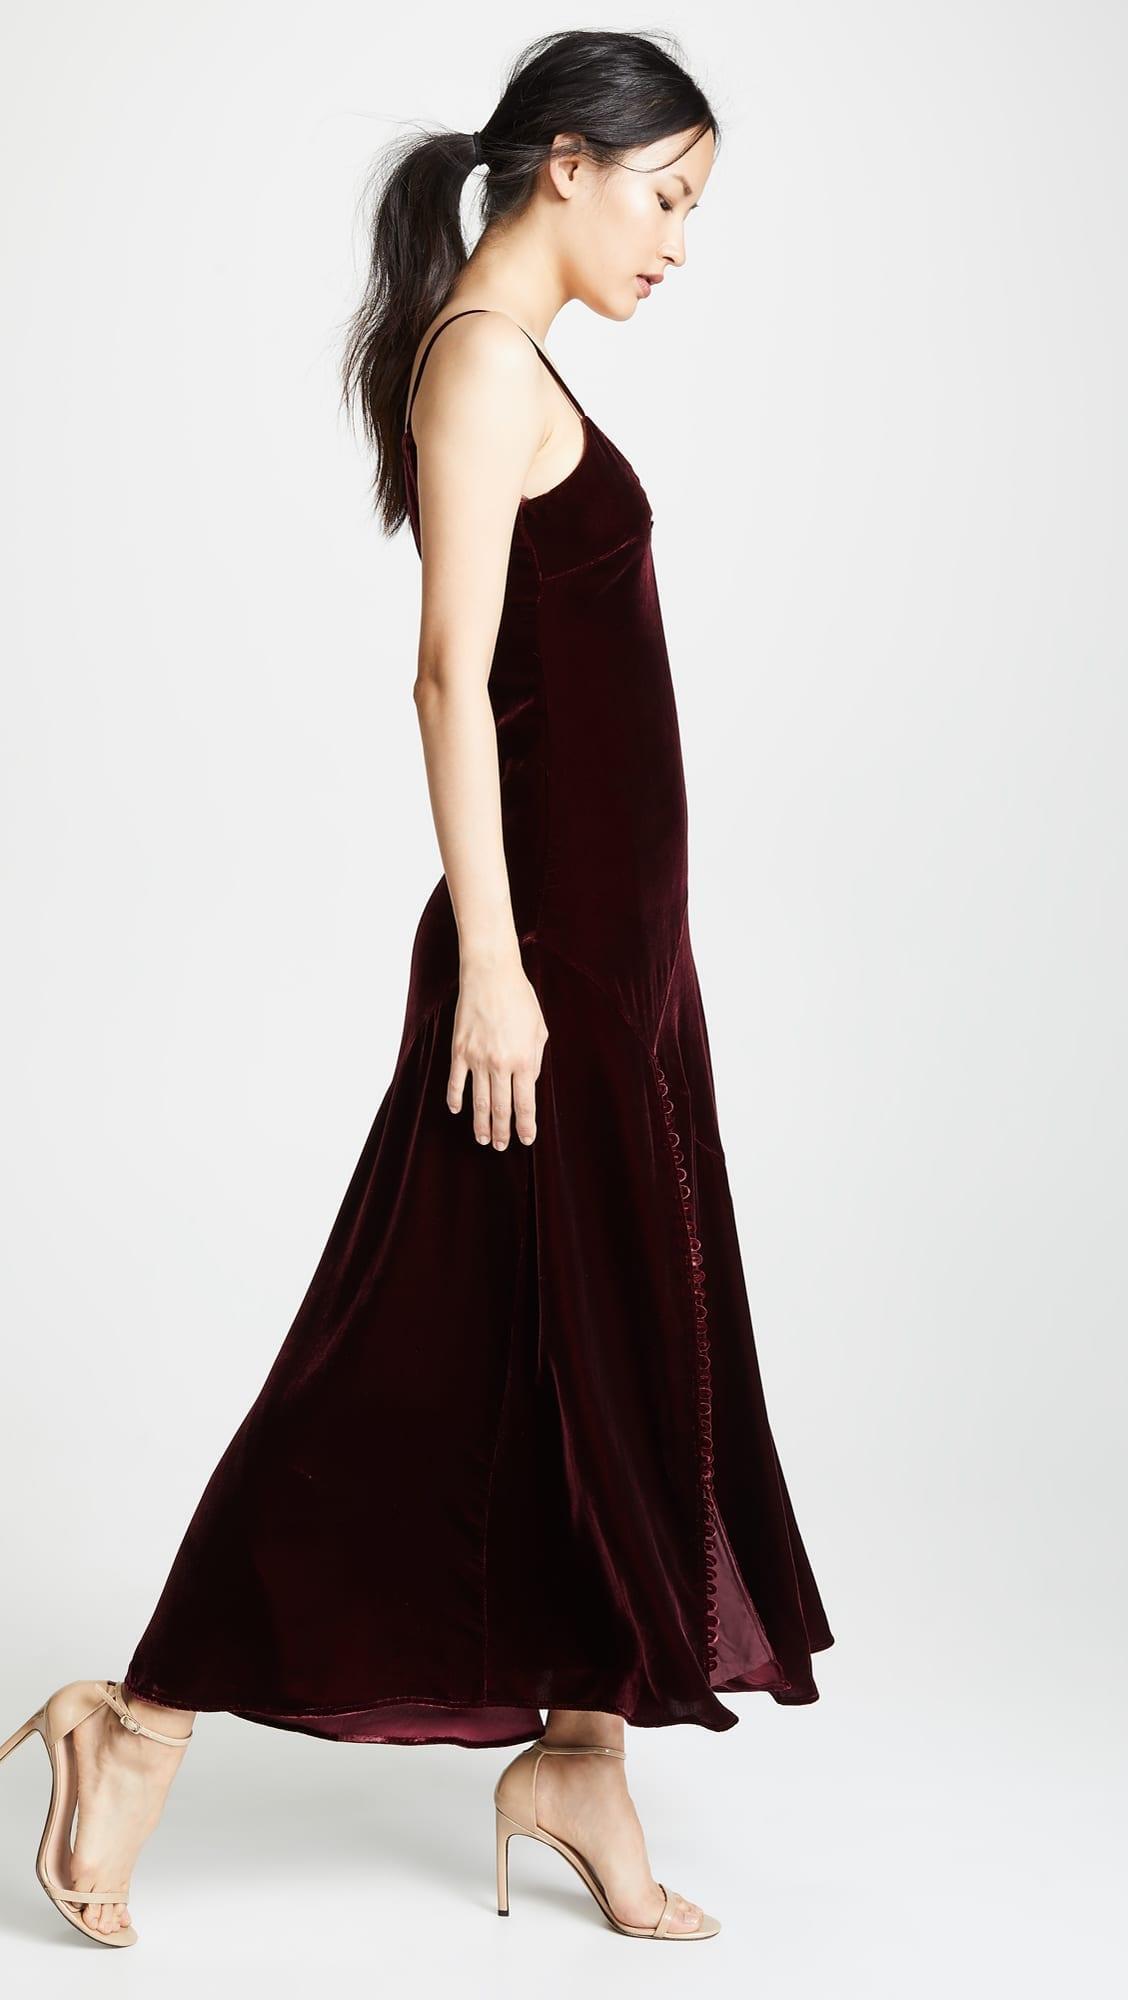 c228b3402eaf NICHOLAS Velvet Slip Burgundy Dress - We Select Dresses